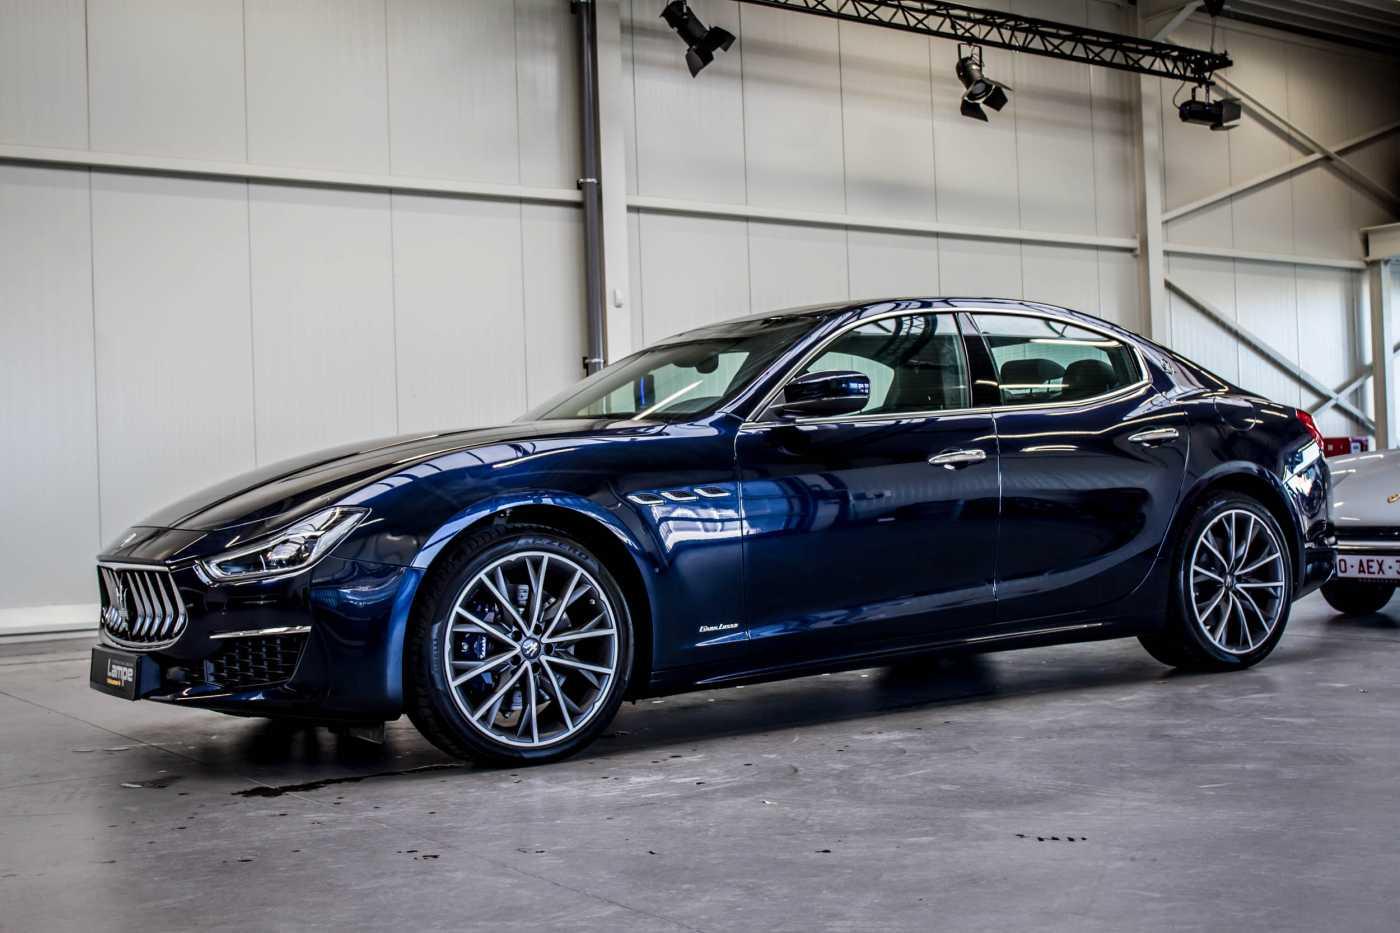 Maserati Ghibli Diesel GranLusso Keyless Sports Exhaust LED Camera 6/29